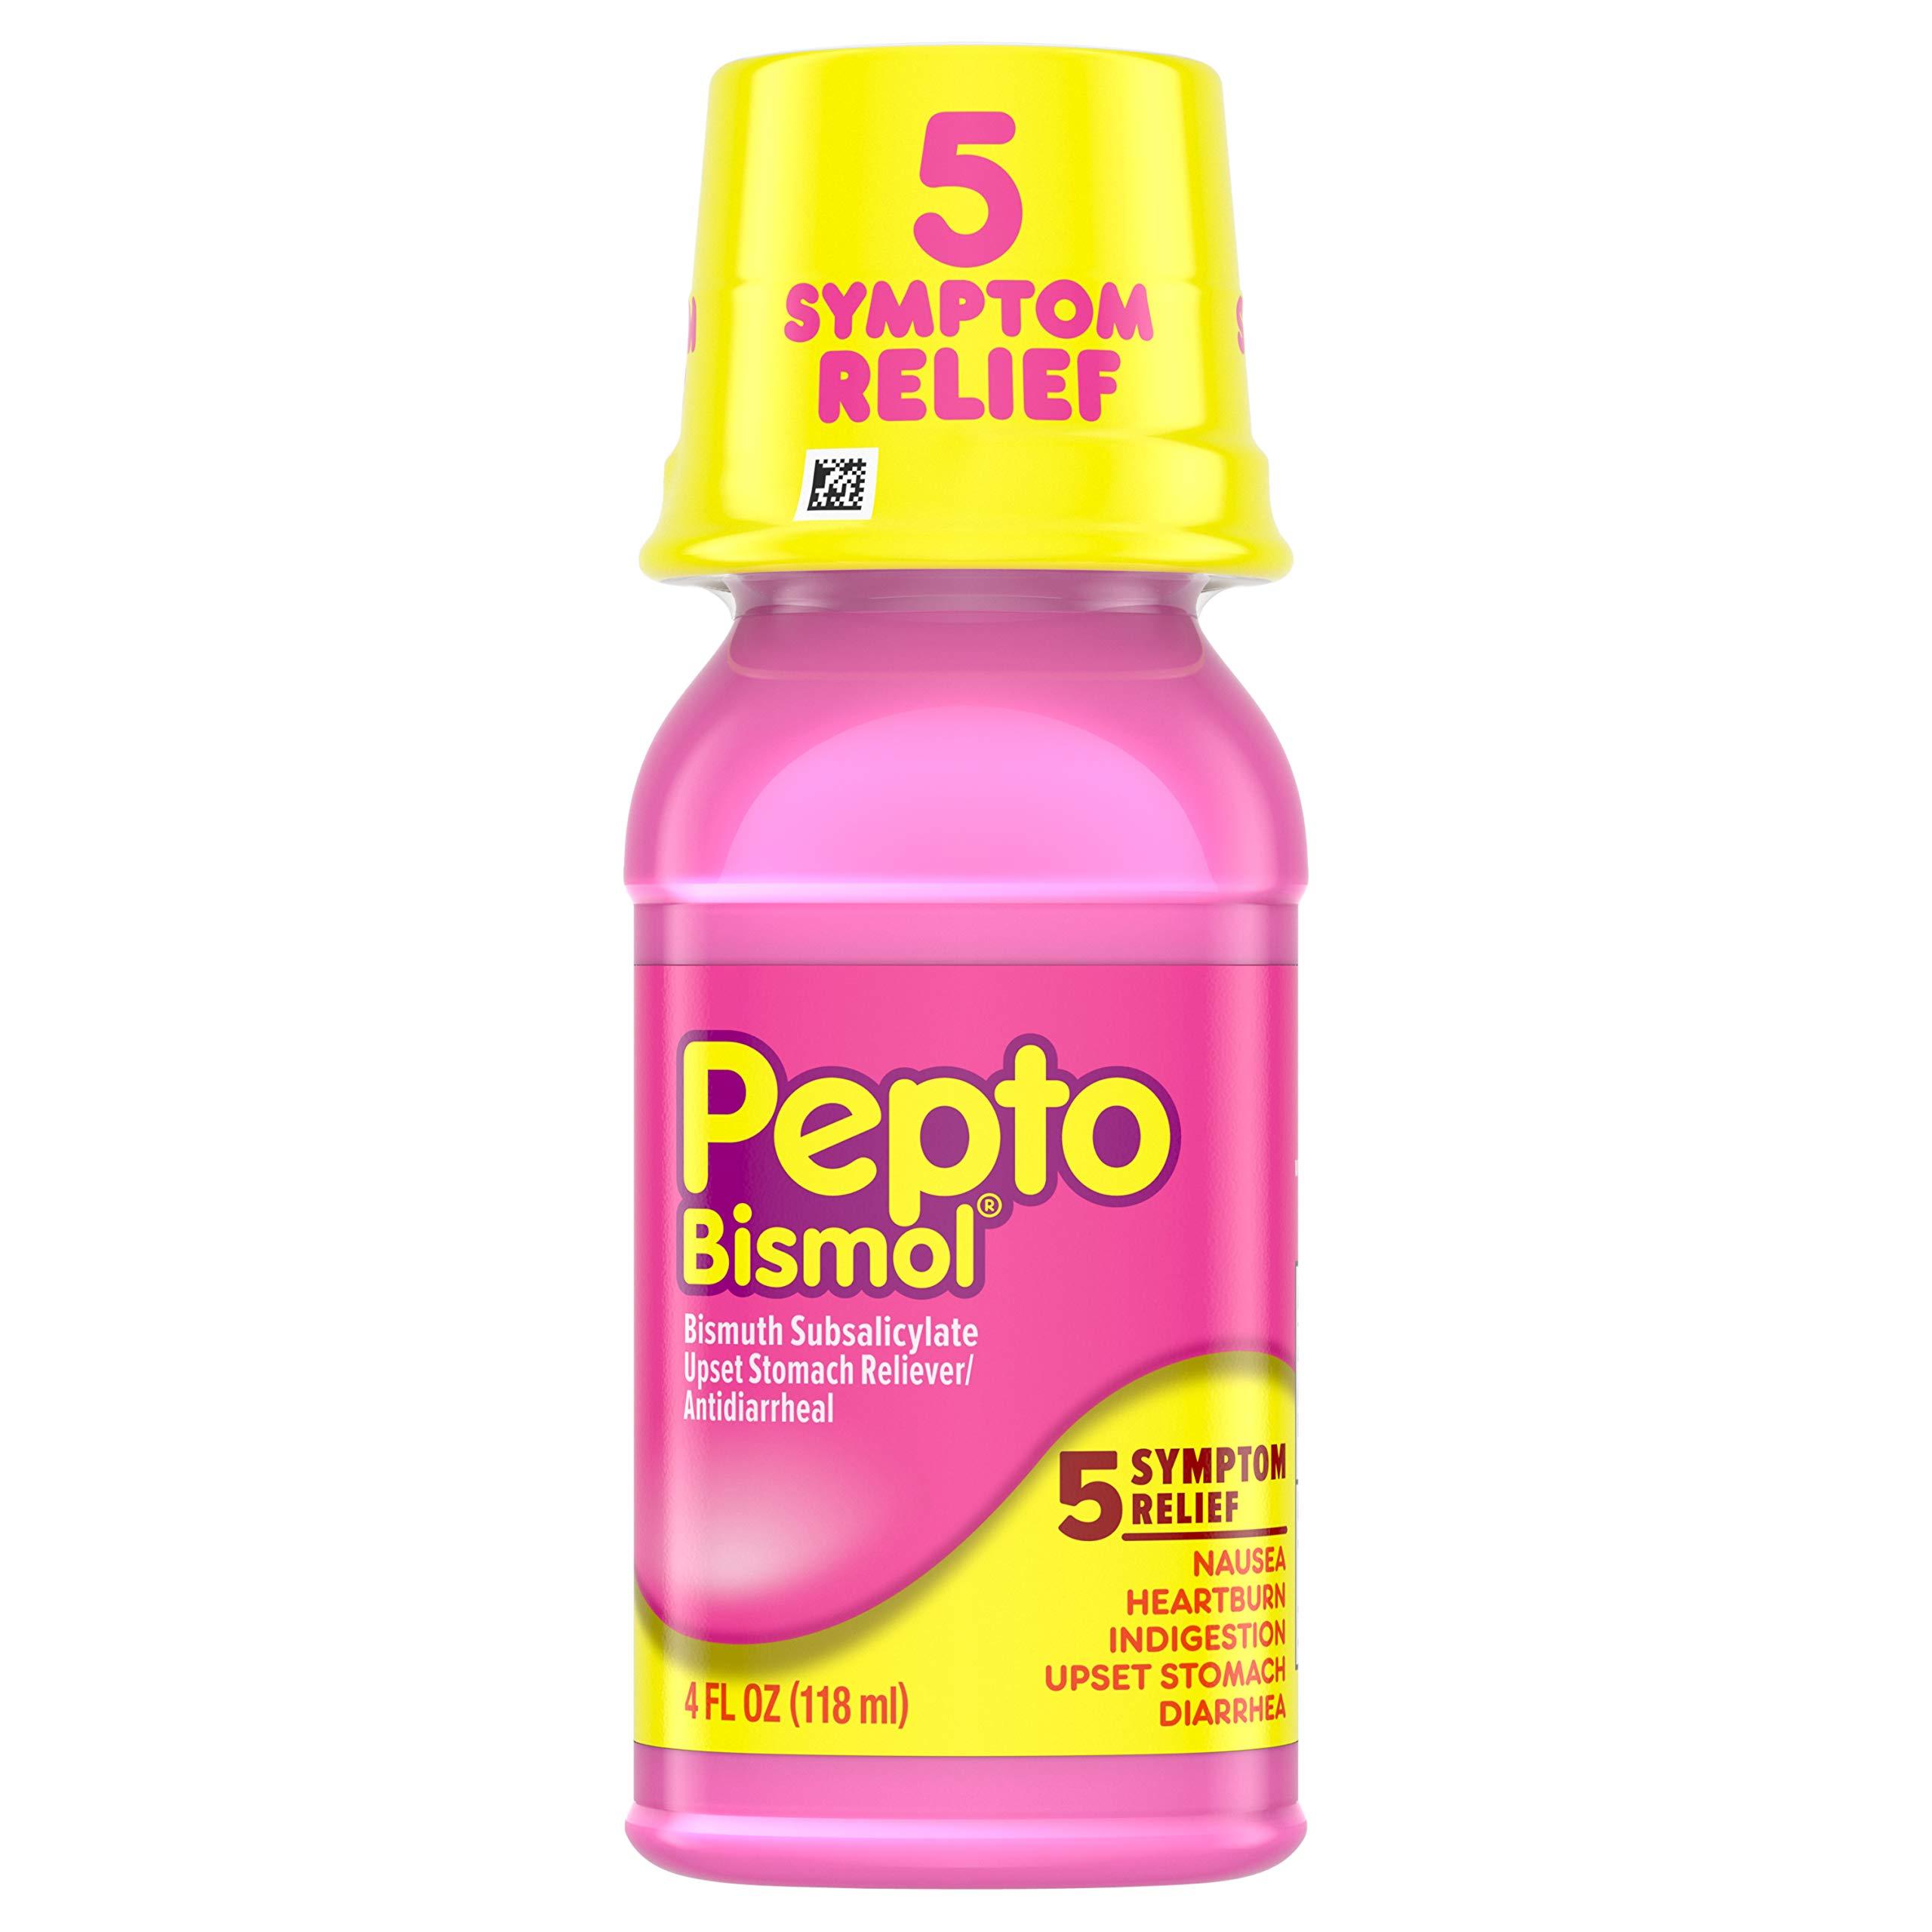 Pepto Bismol Liquid for Nausea, Heartburn, Indigestion, Upset Stomach, and Diarrhea Relief, Original Flavor 4 oz